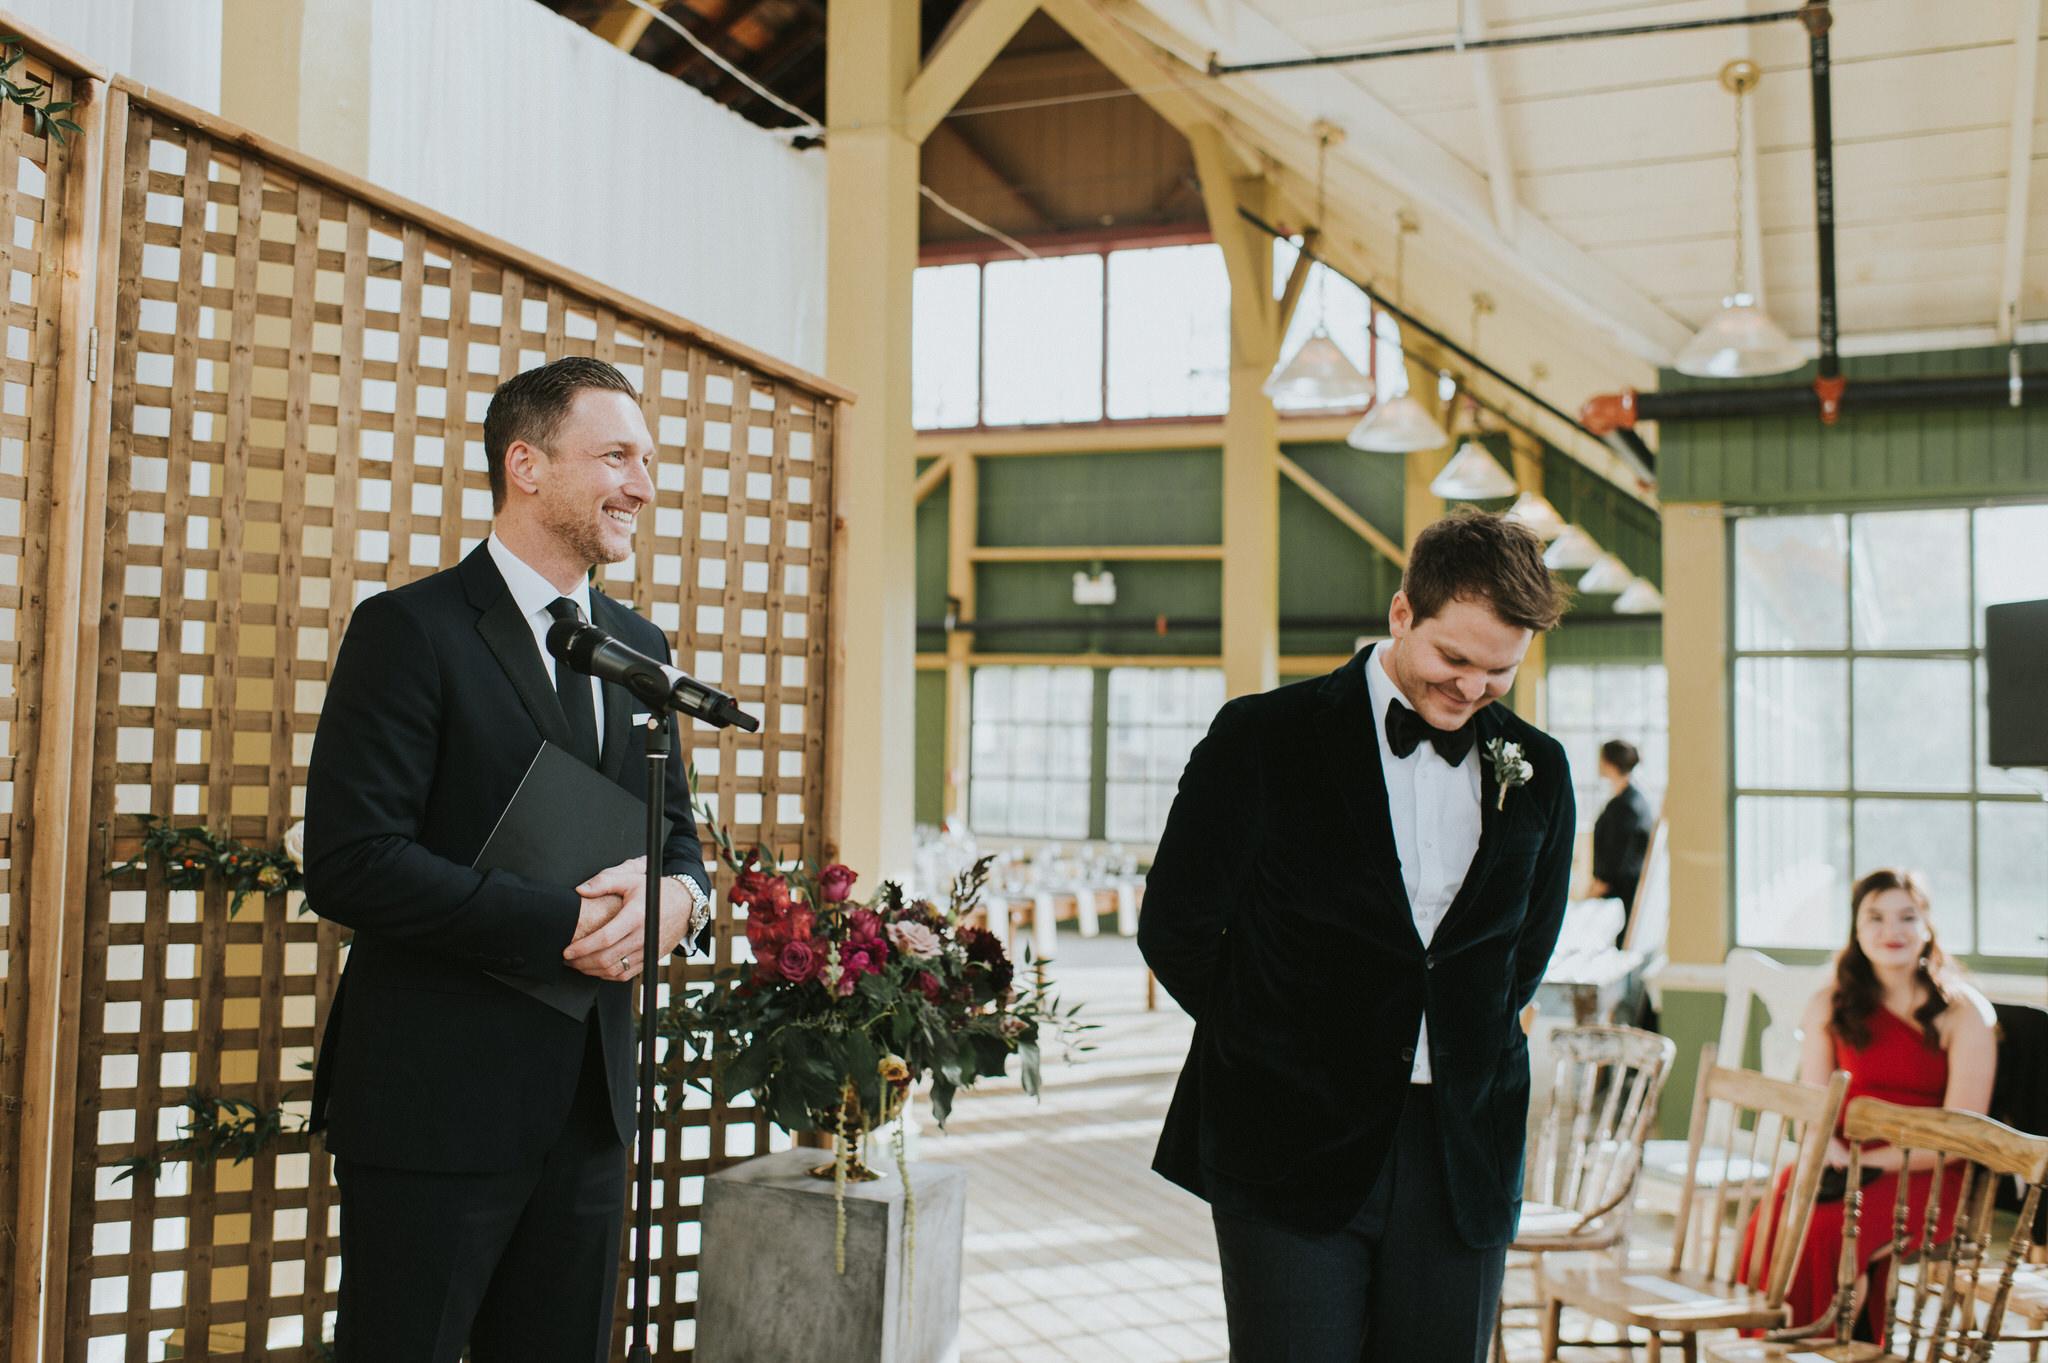 scarletoneillphotography_weddingphotography_prince edward county weddings104.JPG